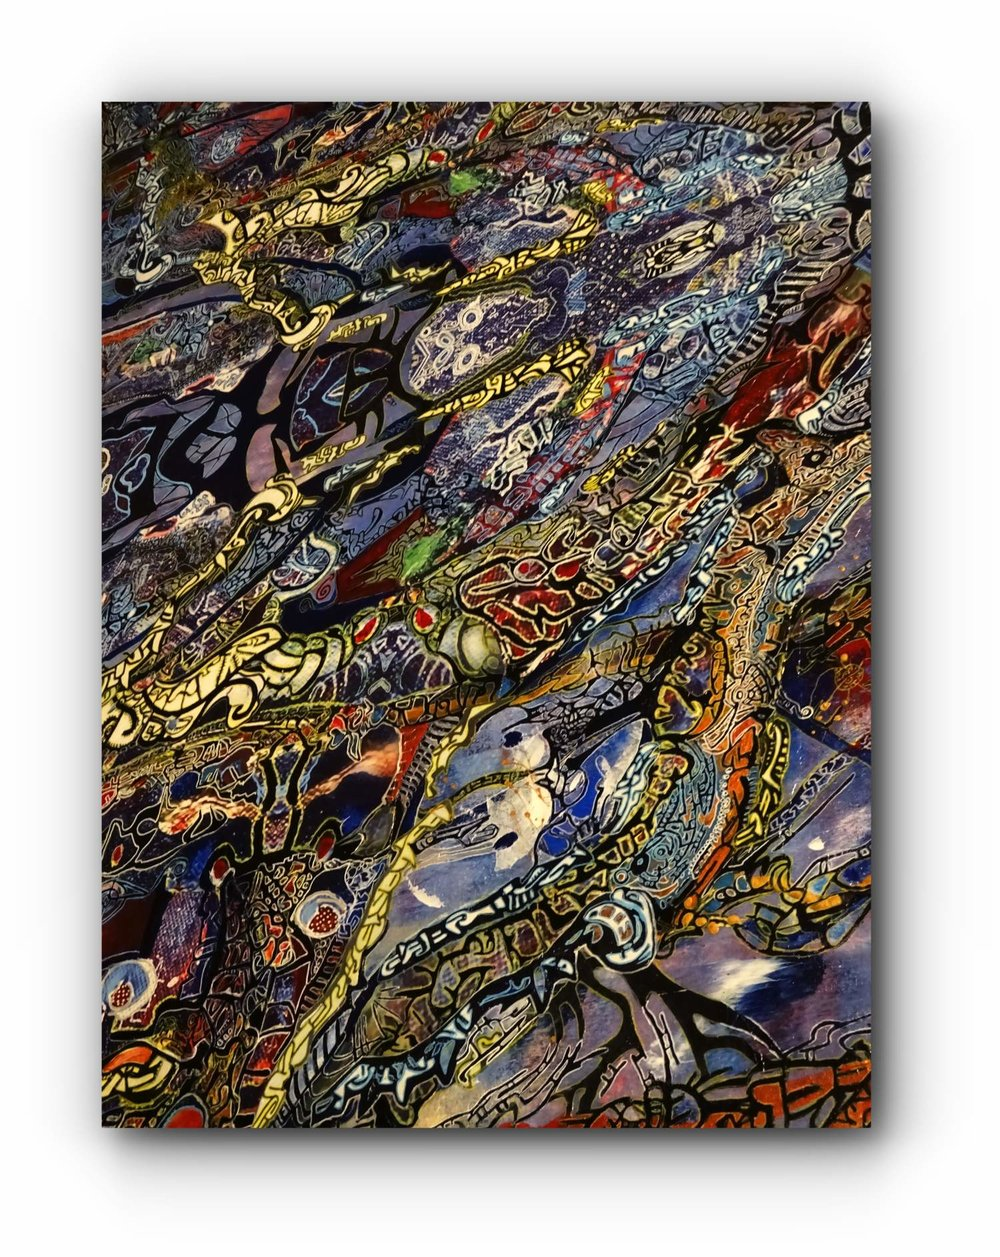 painting-detail-1-innerspace-artist-duo-ingress-vortices.jpg